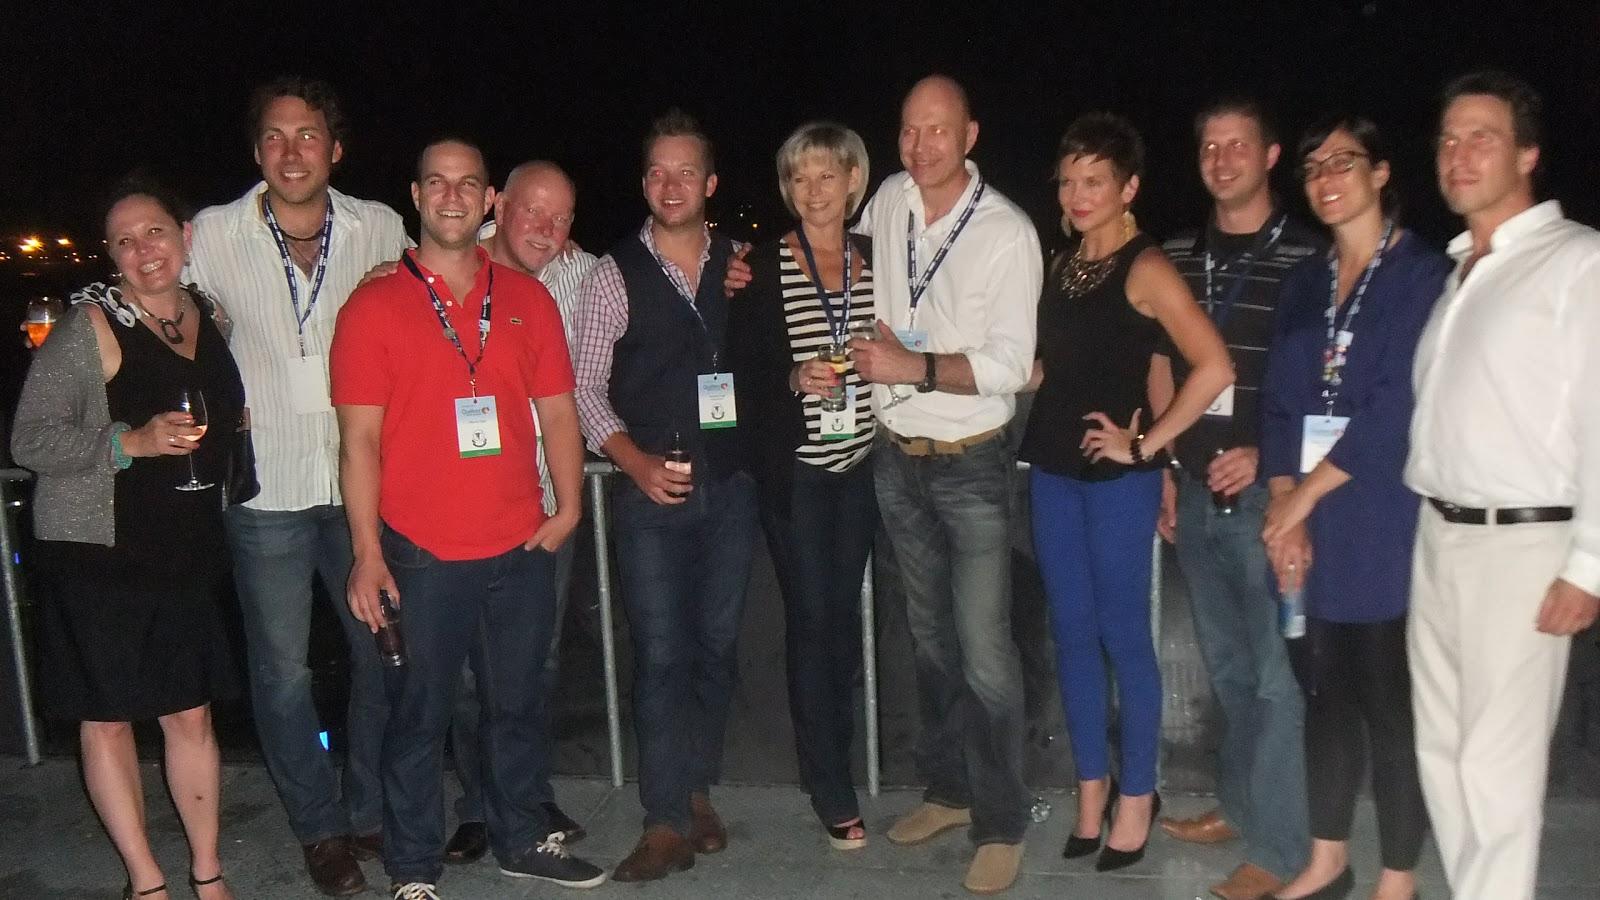 2013 GN Convention Quebec City